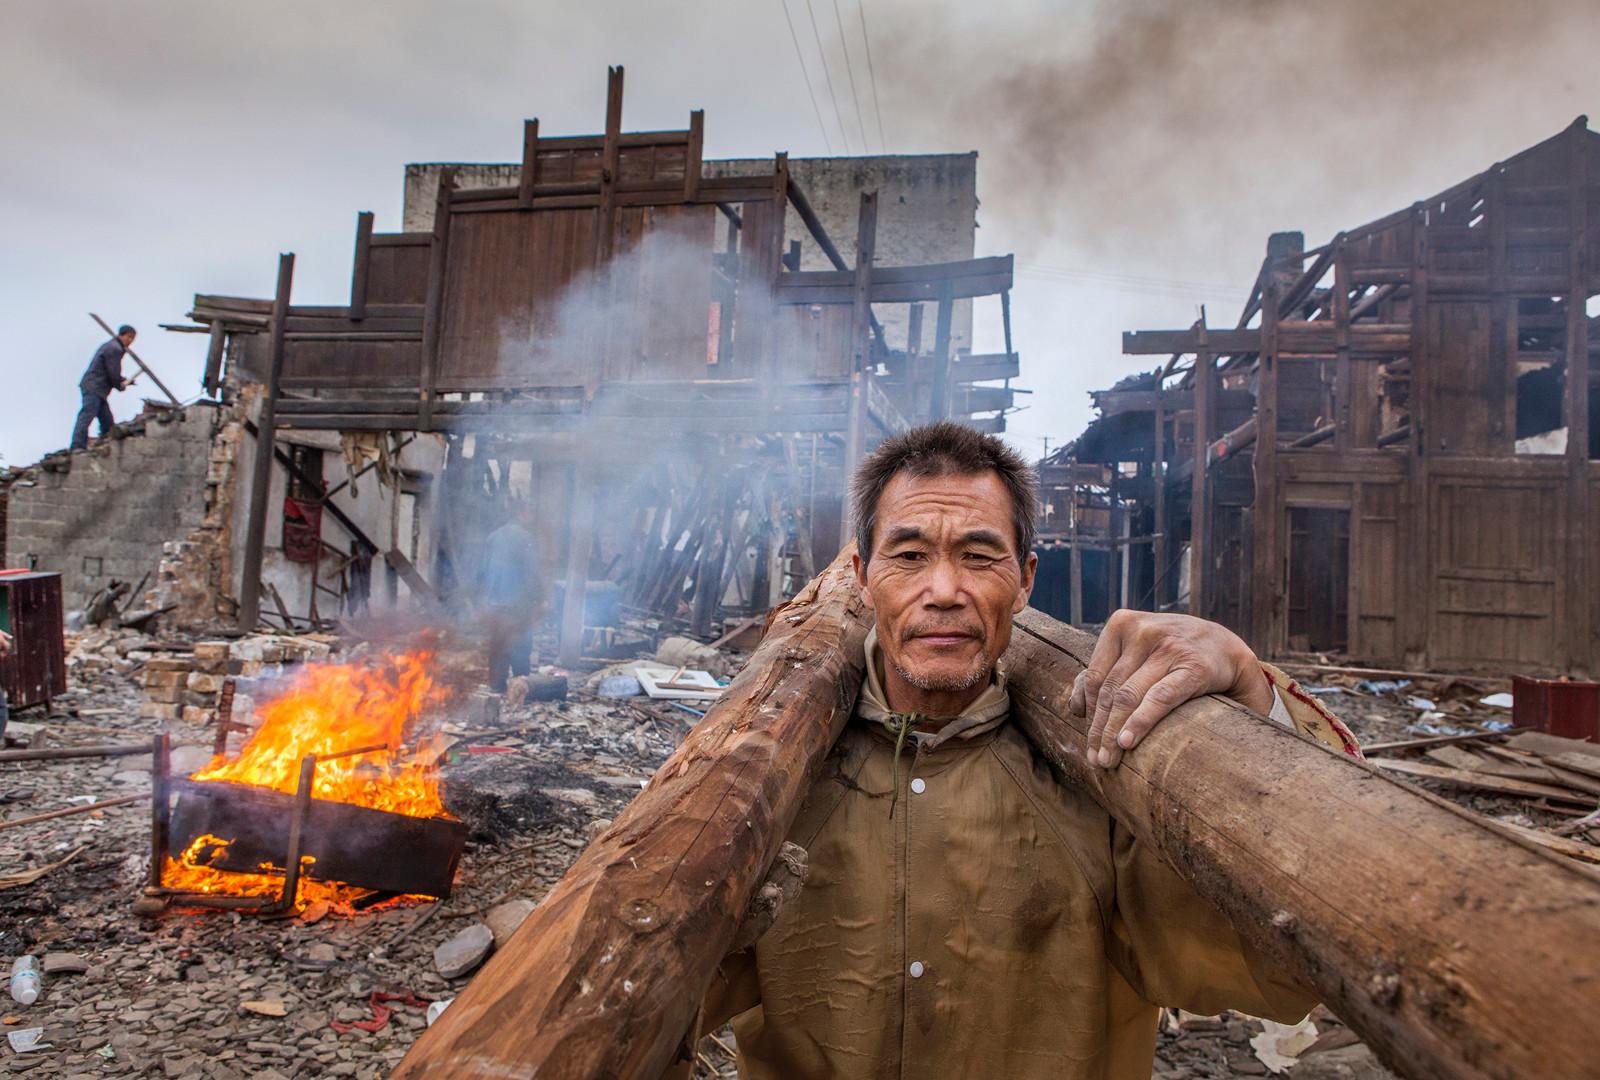 kuang-huimin-lost-dreams-in-tuokou-photography-of-china-3.jpg